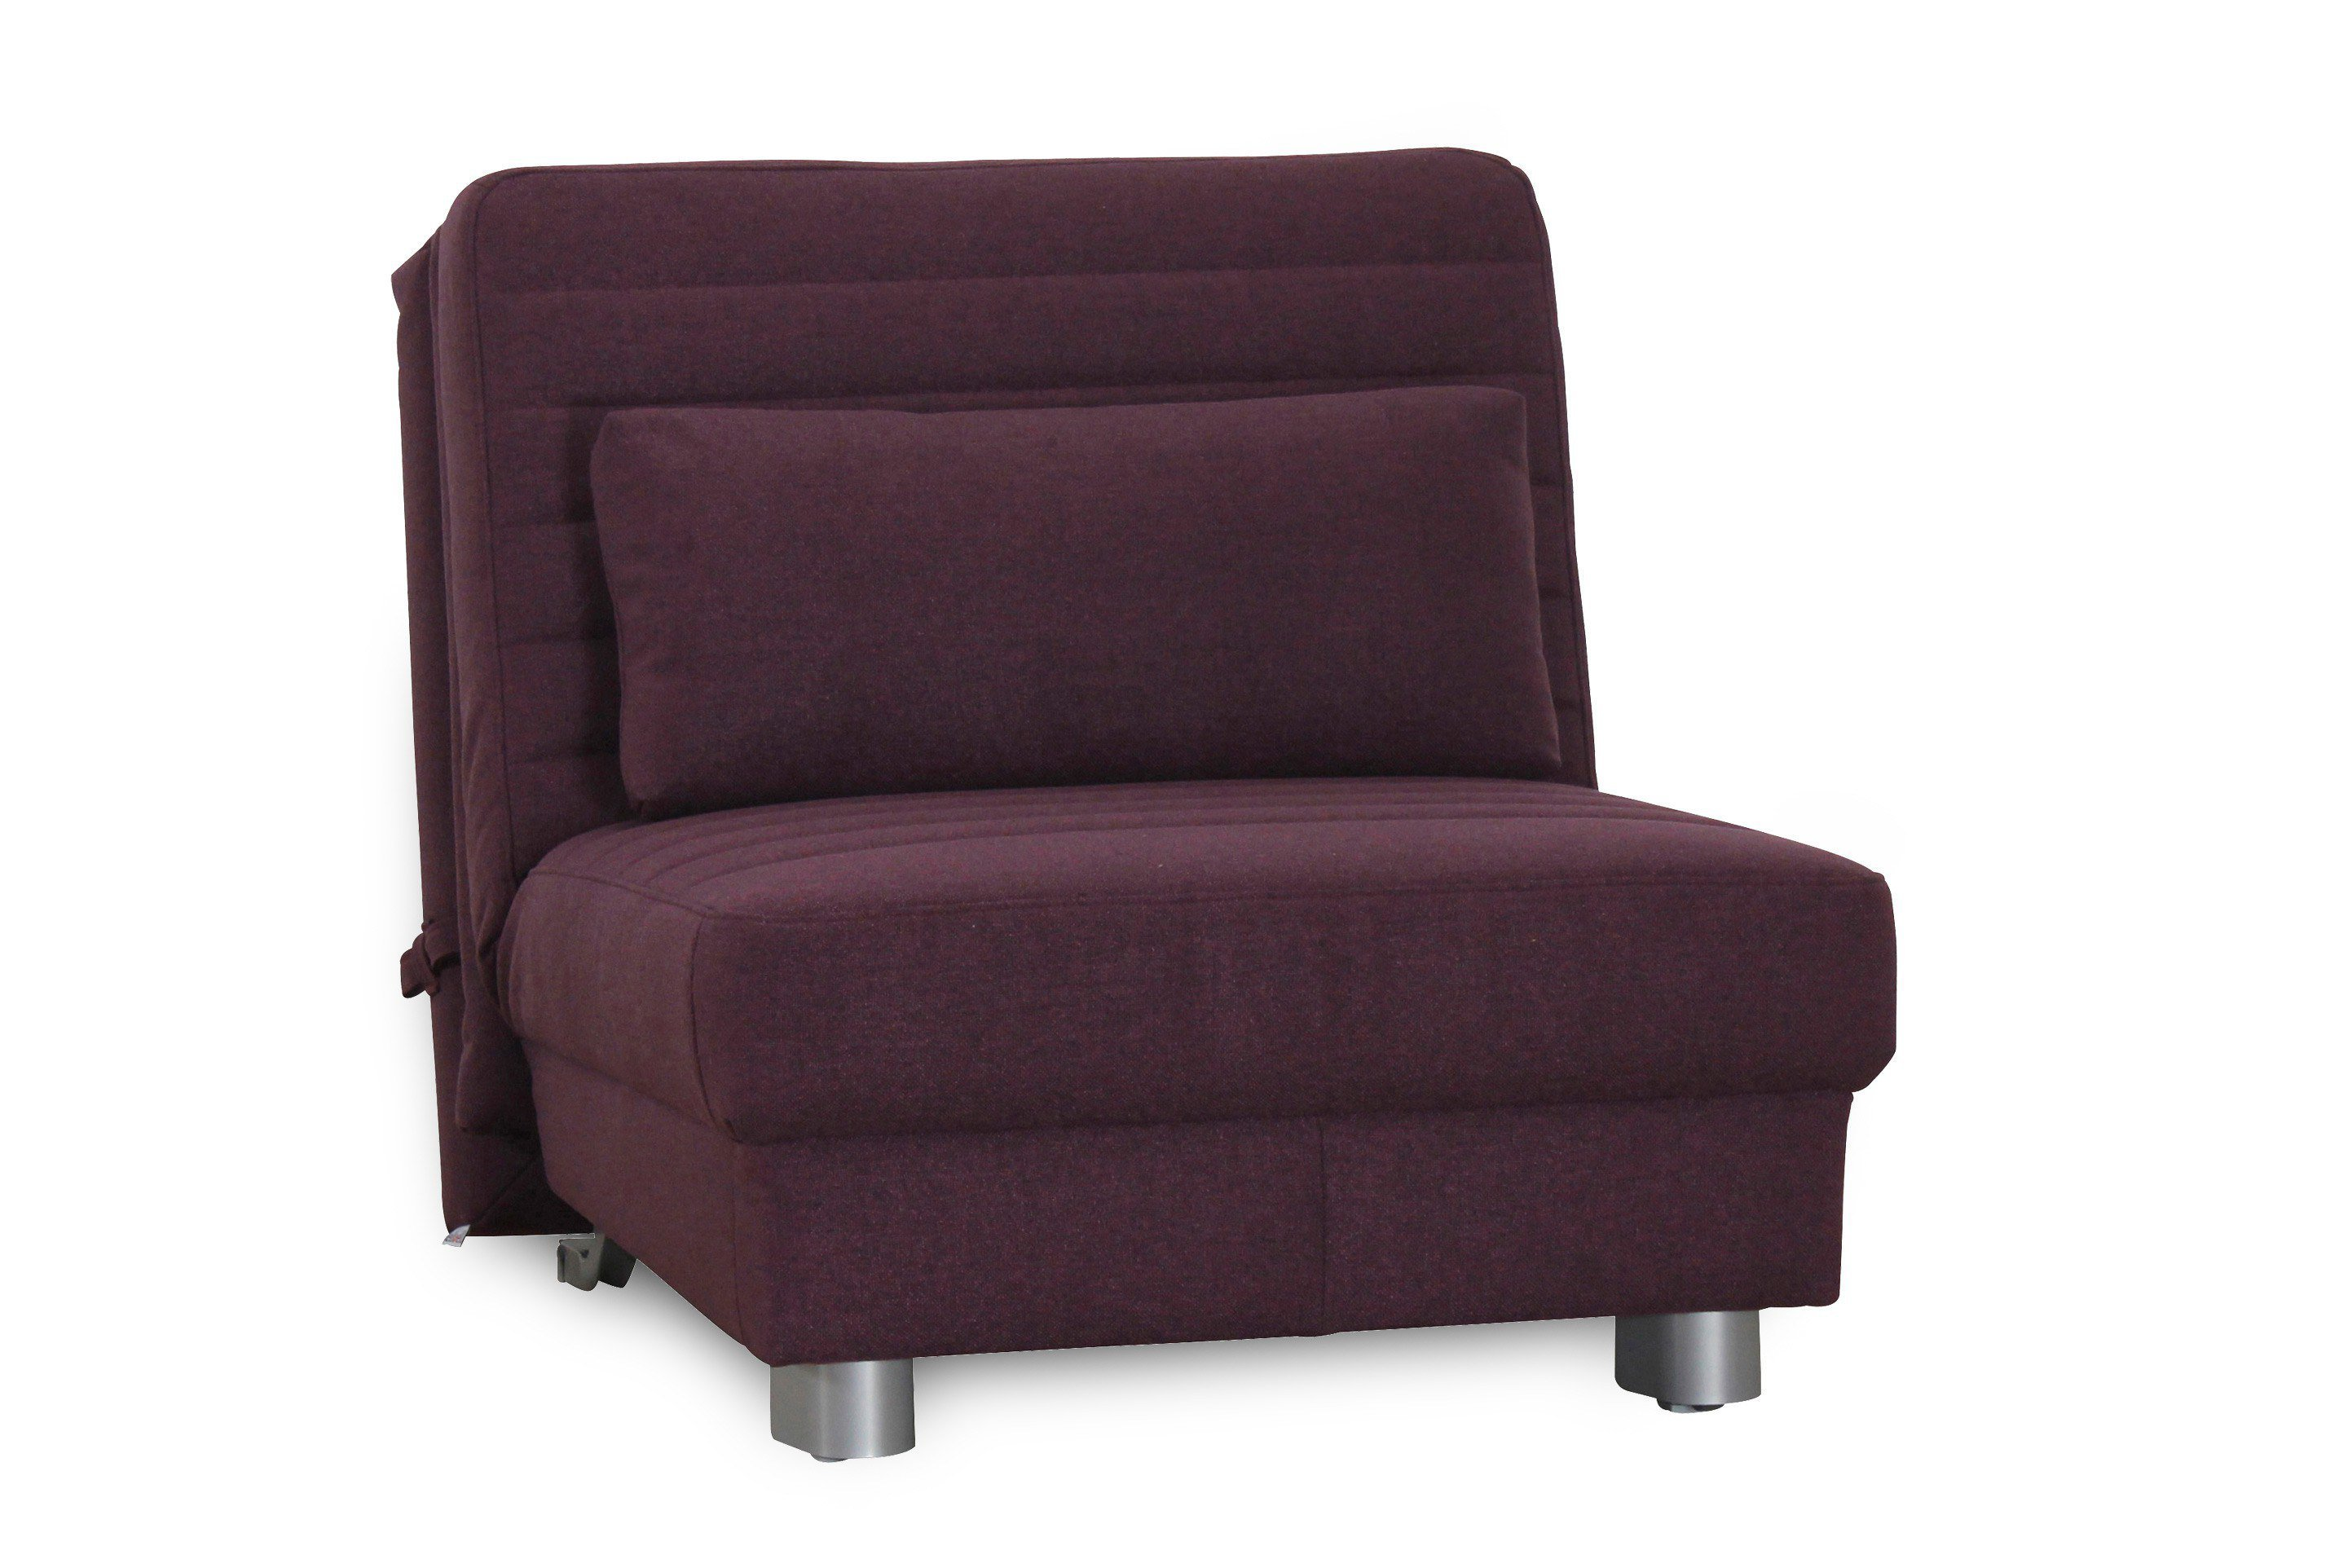 ell ell jess schlafsessel mit verstellbarem kopfteil m bel letz ihr online shop. Black Bedroom Furniture Sets. Home Design Ideas